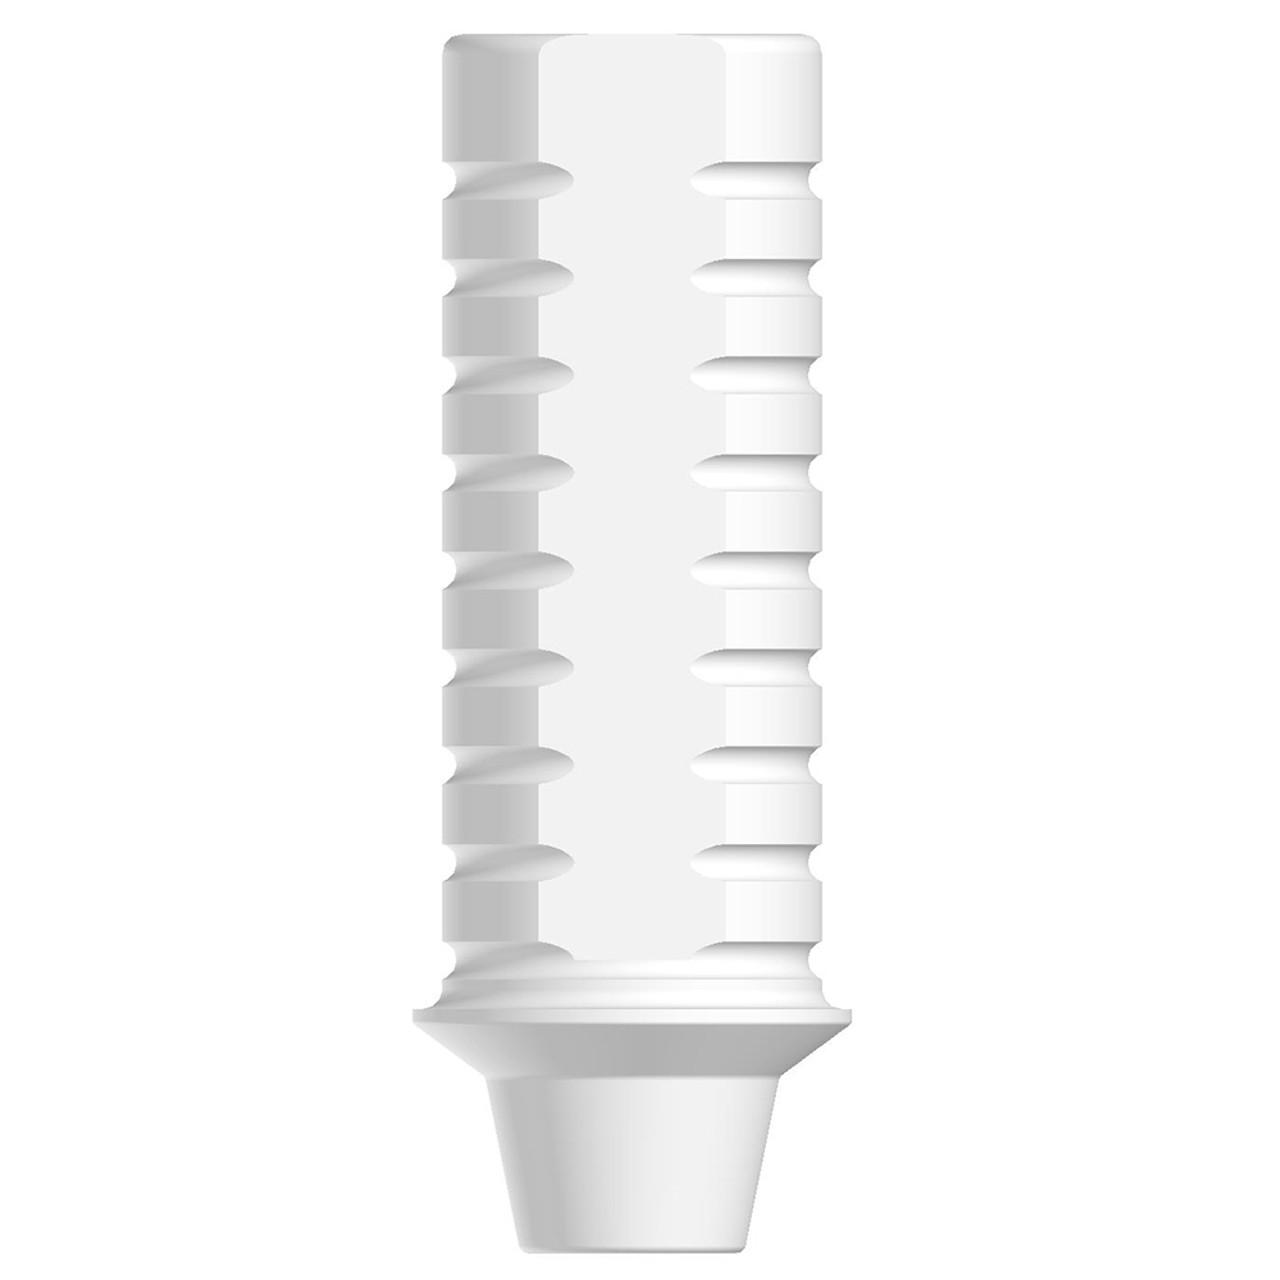 All-Plastic Castable Abutment (Astra EV Compatible)